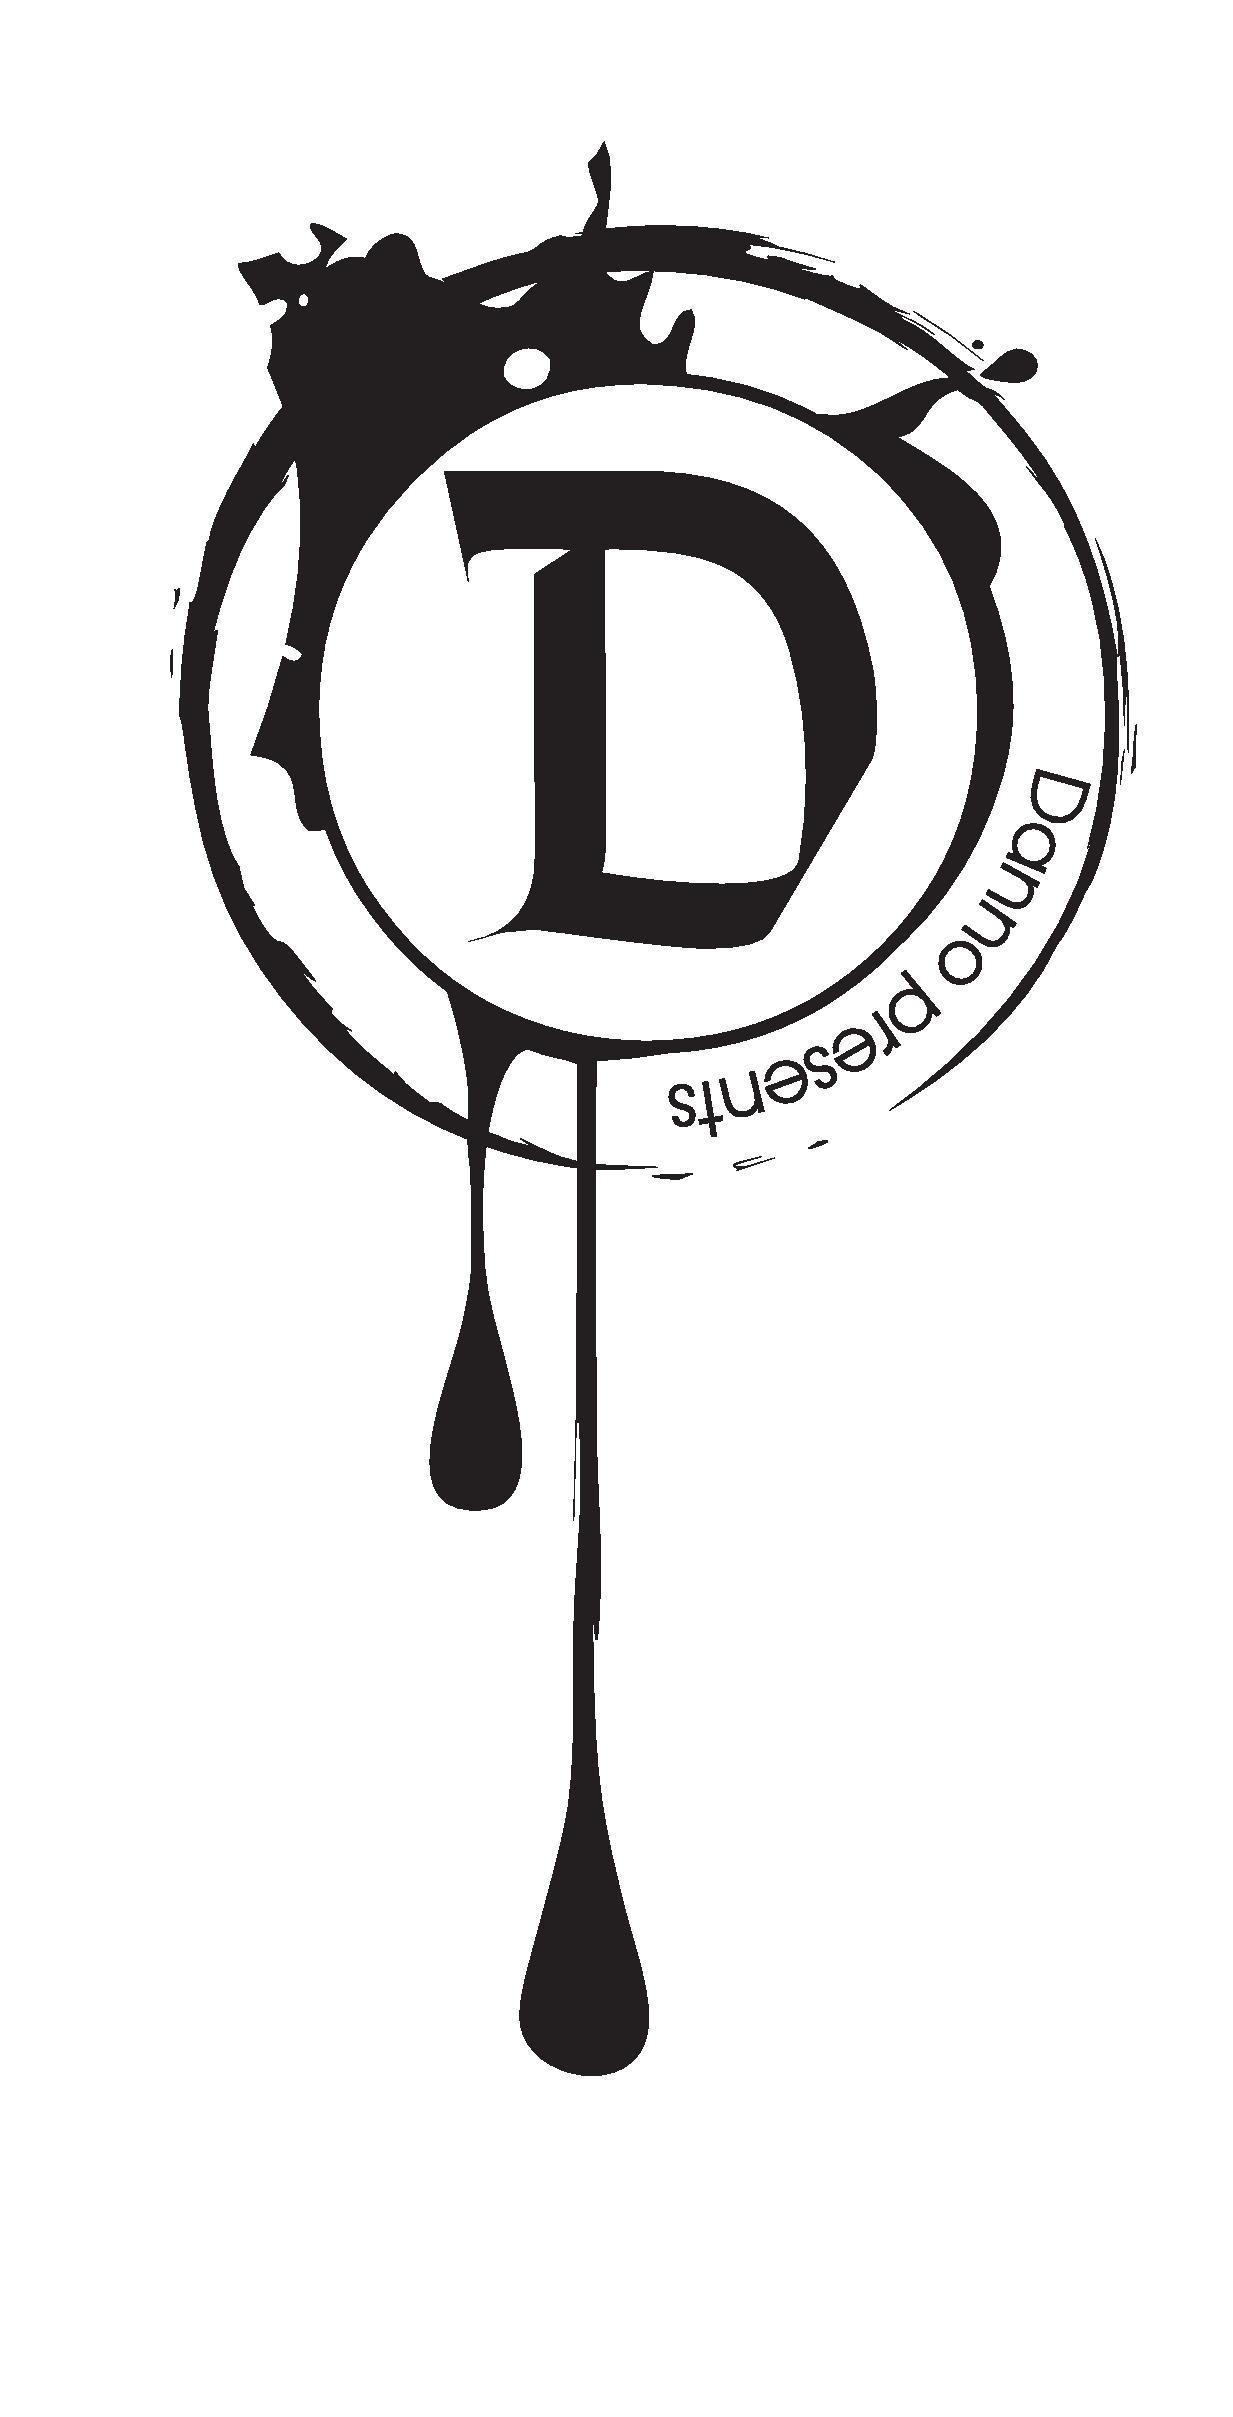 ANUHEA & ETHAN TUCKER BAND   OlympiaFilmSociety org